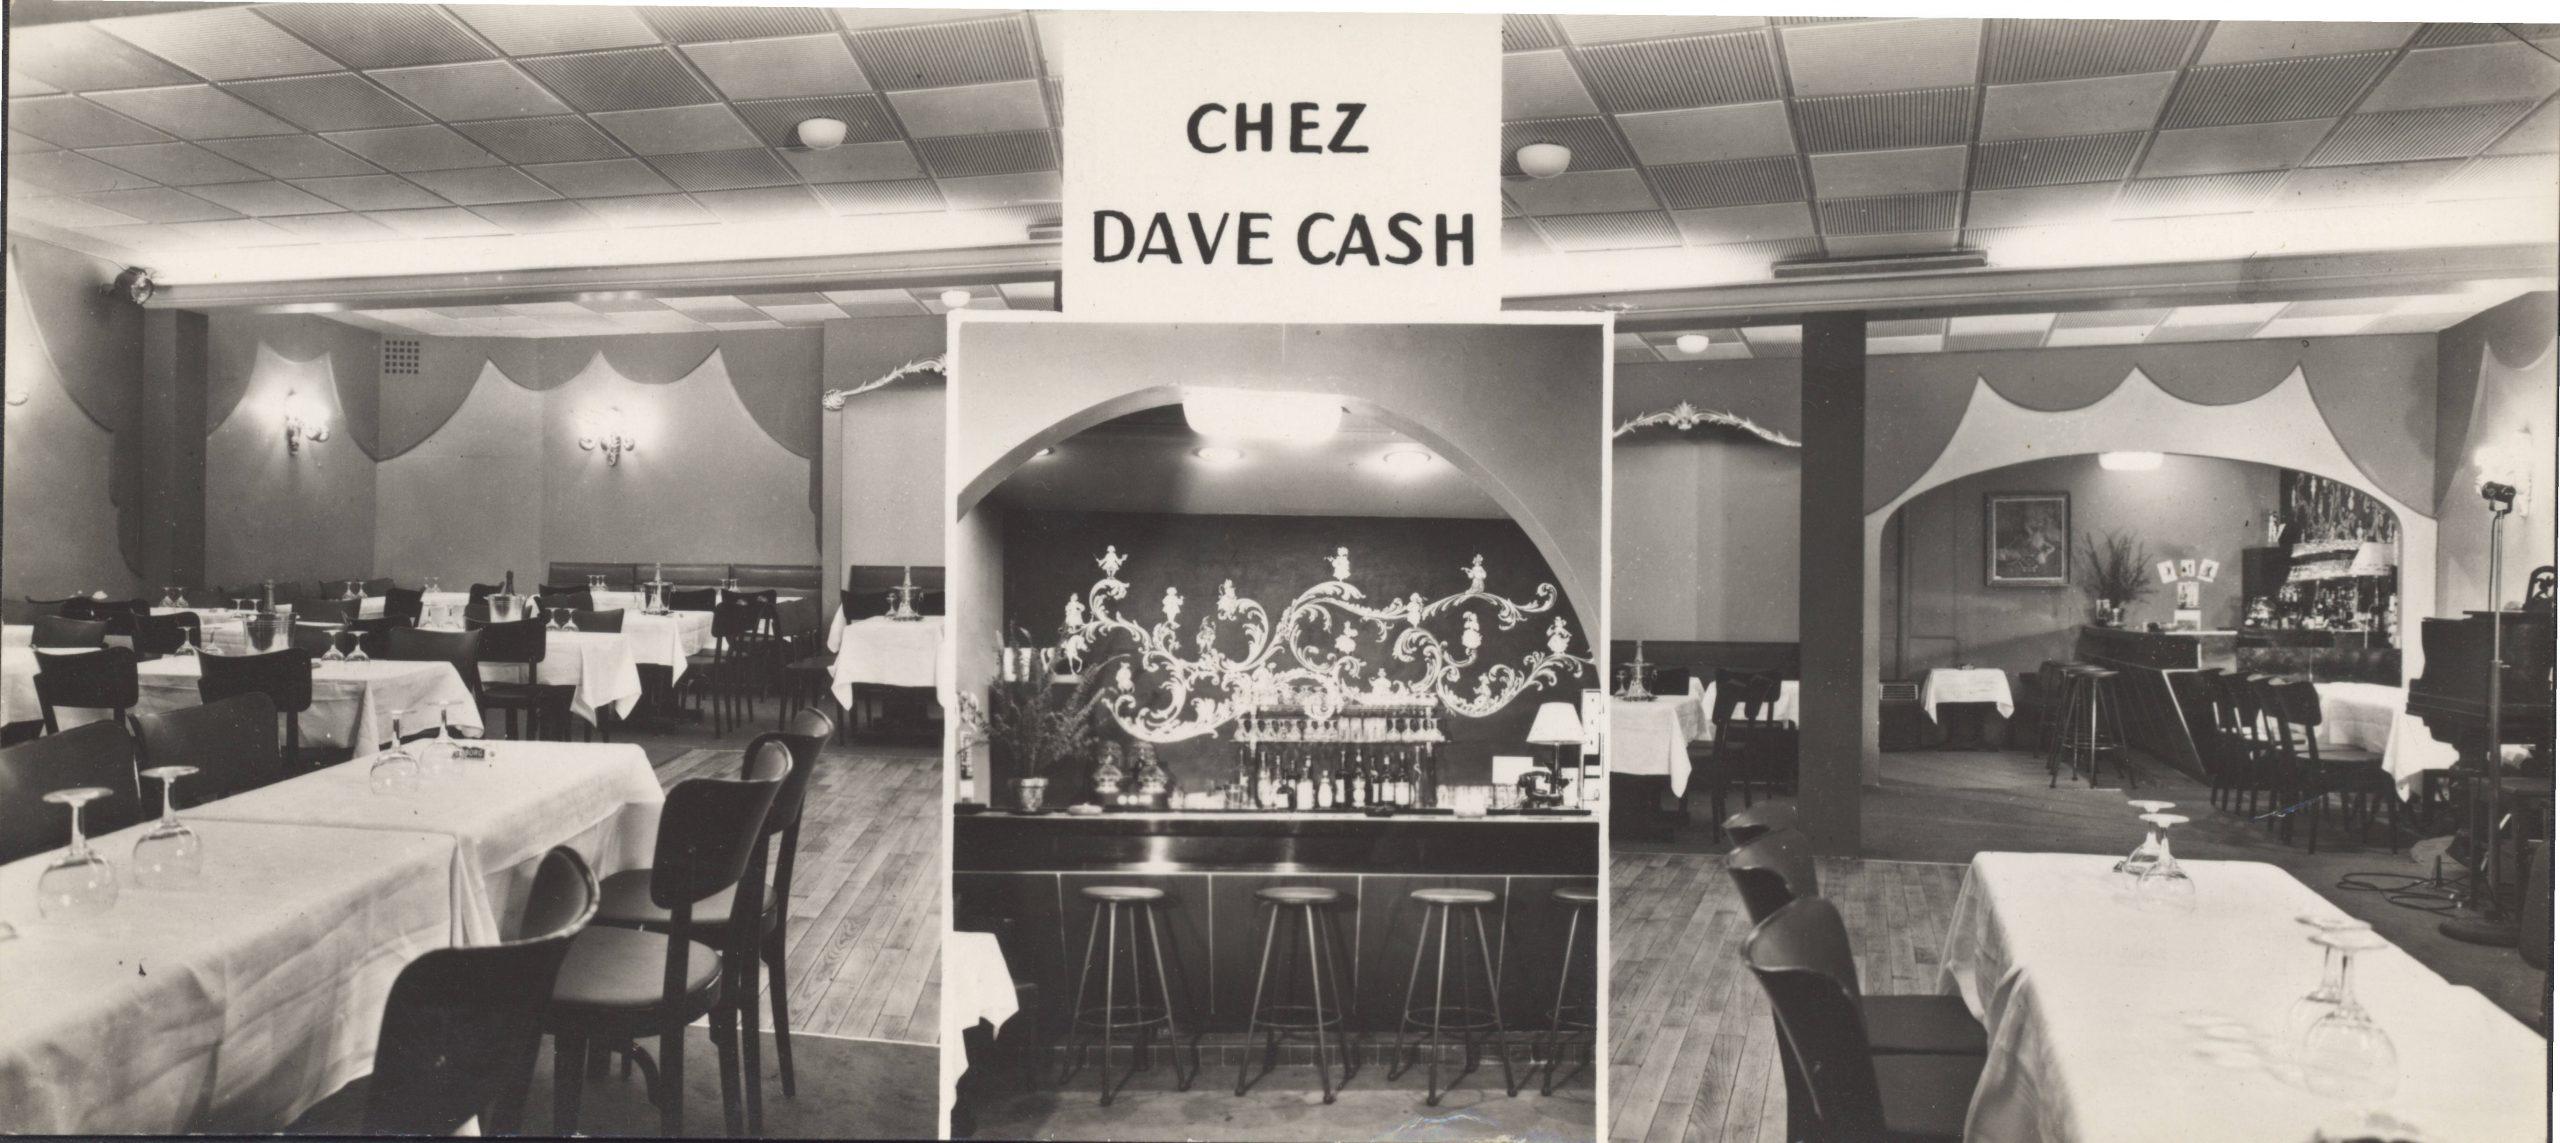 dave_cash_2.jpg